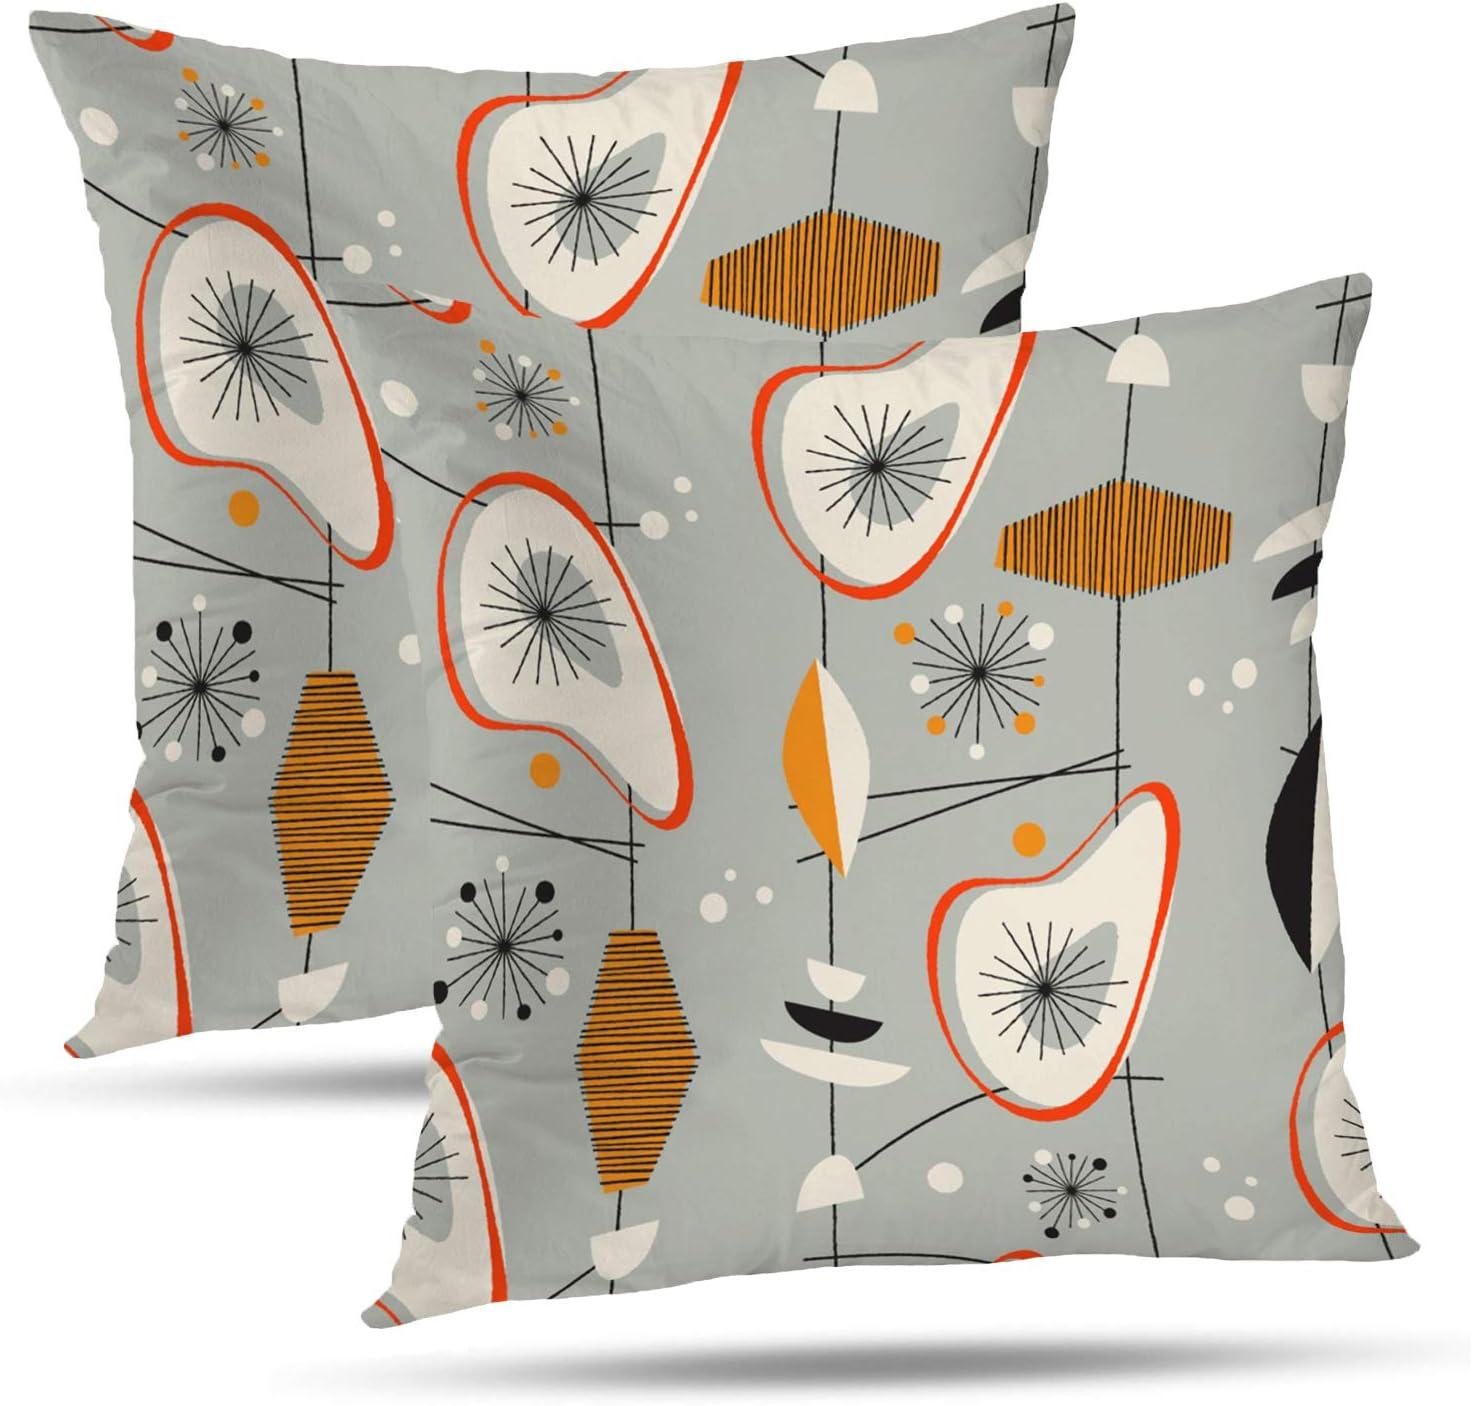 Retro Design 18/'/' Cushion Cover Pillow Case Pink Flower Blue Cupcake Home Decor